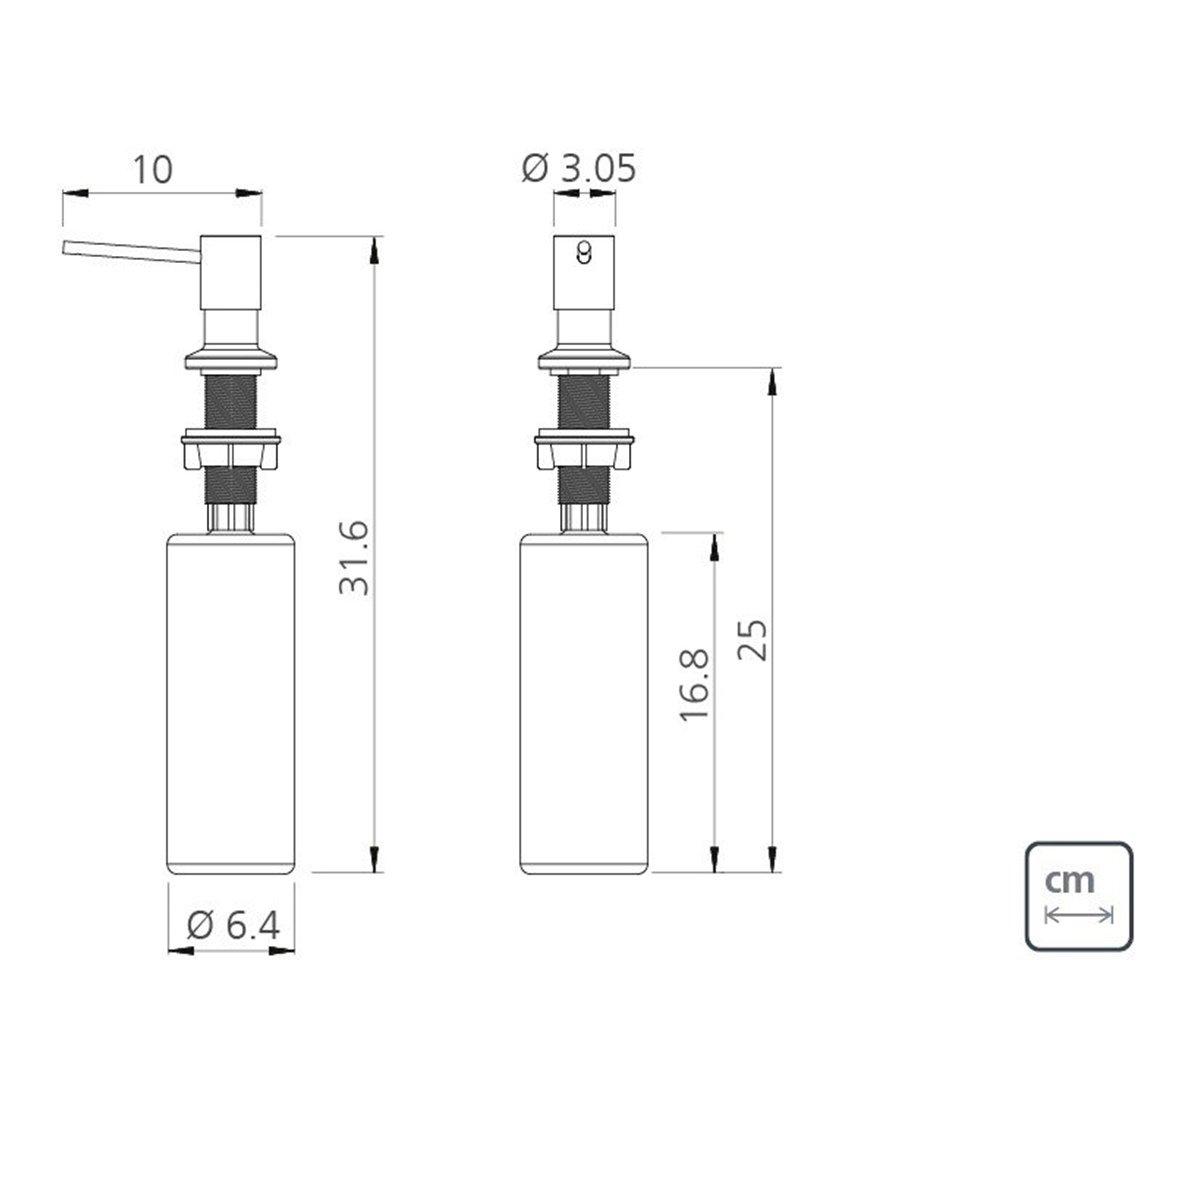 Dosador De Detergente Inox Fosco Tramontina 500 ml